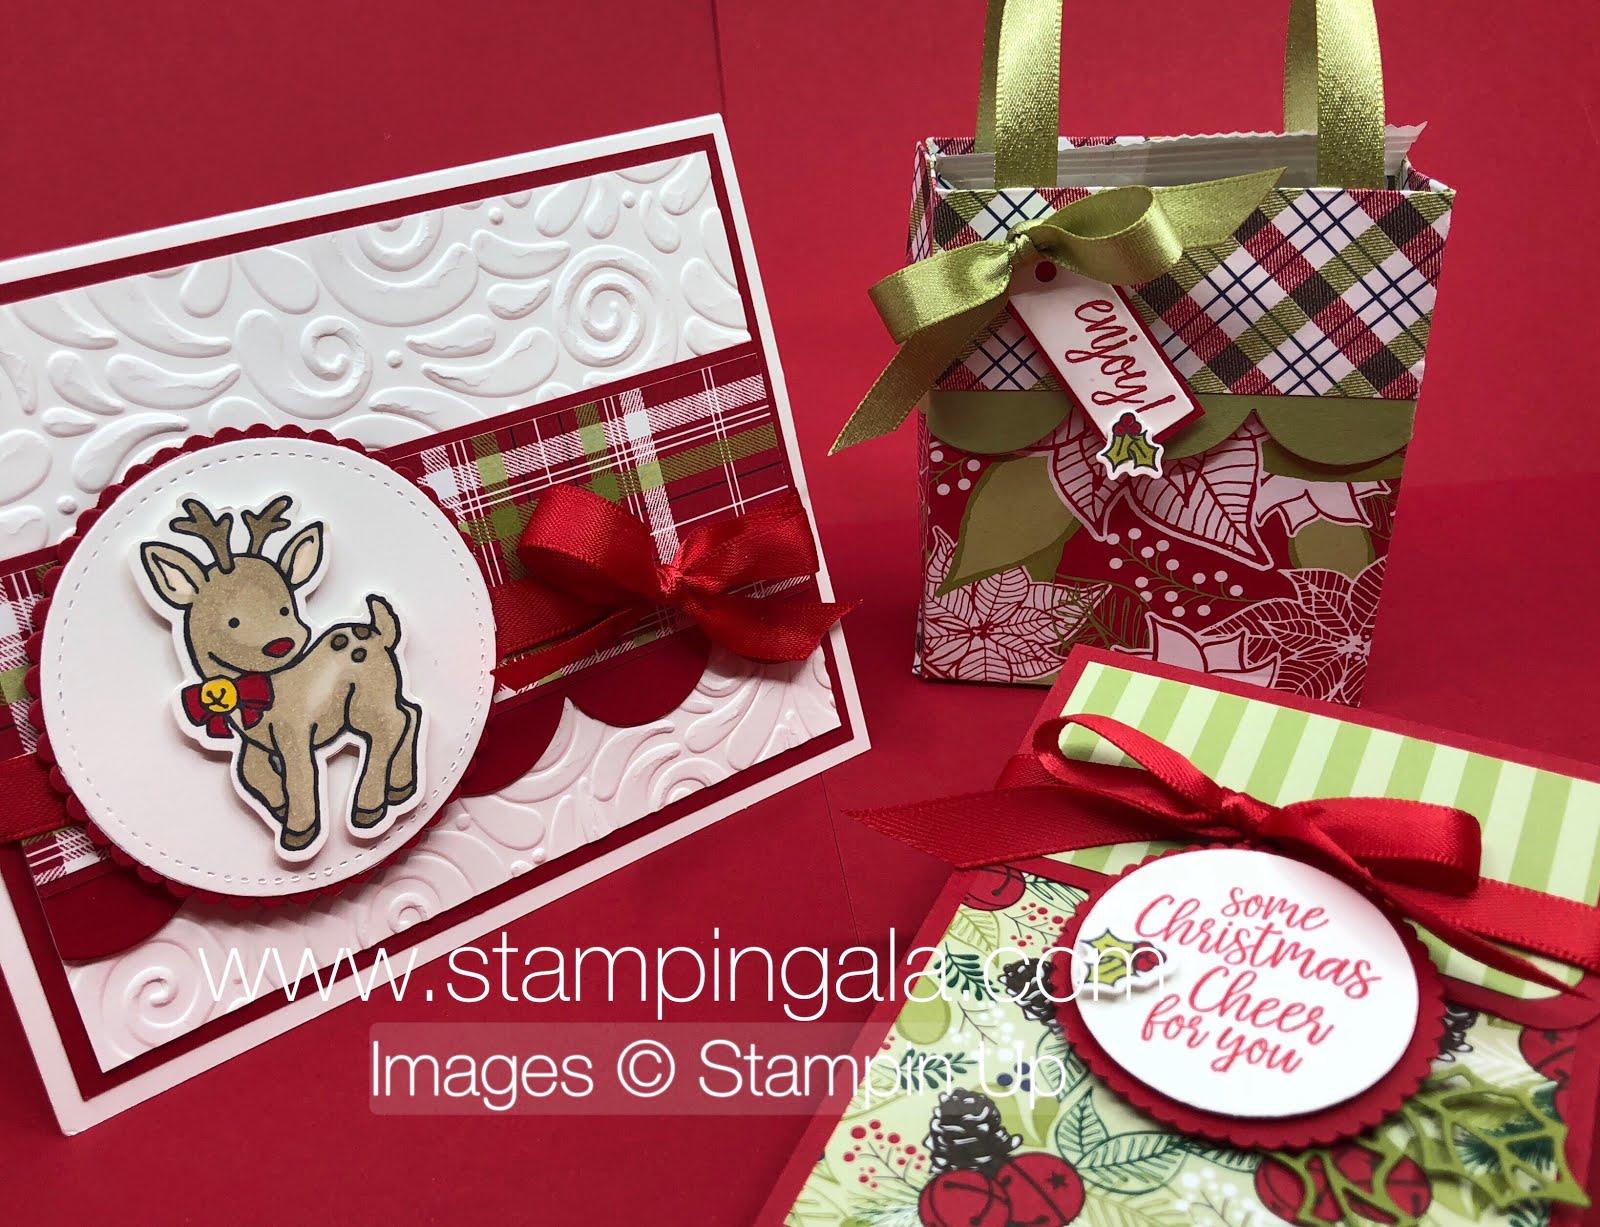 Under The Mistletoe Designer Series Paper Stampin Gala